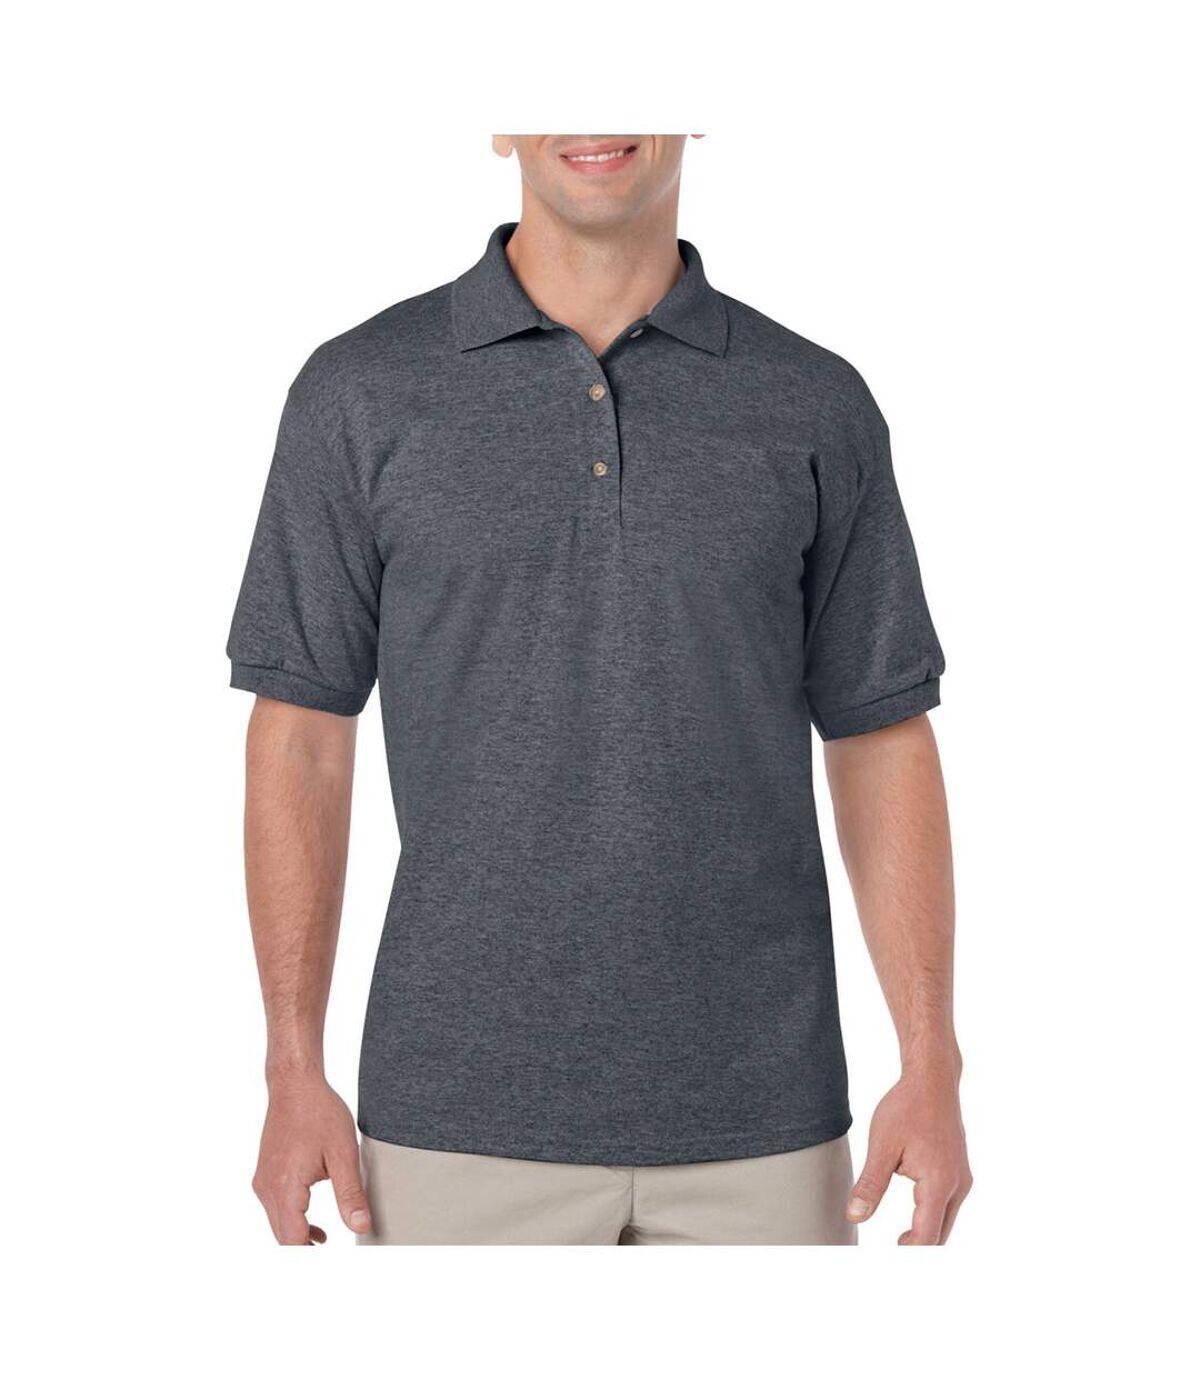 Gildan Adult DryBlend Jersey Short Sleeve Polo Shirt (White) - UTBC496